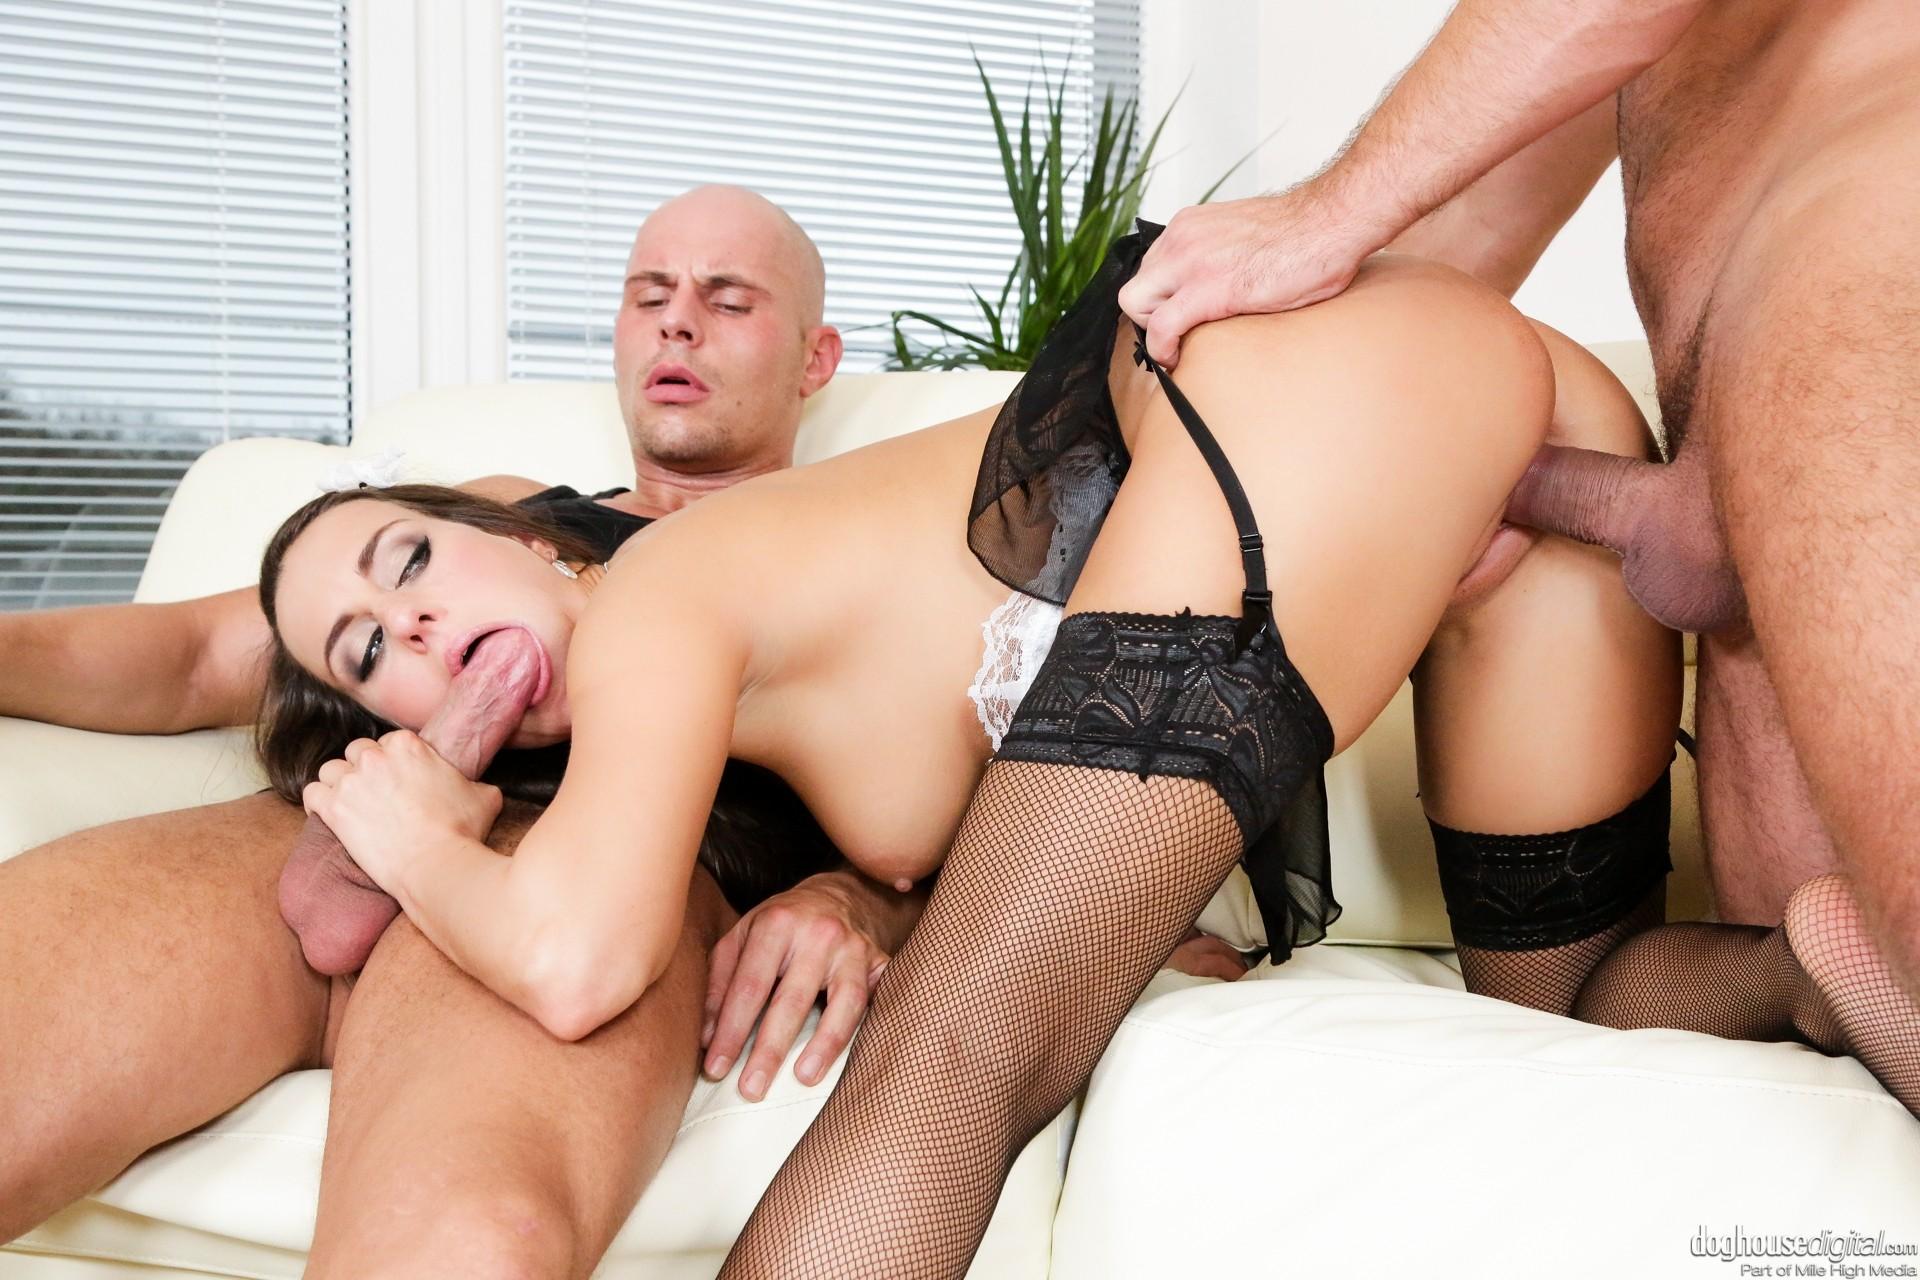 woman haveing sex pic s – Amateur